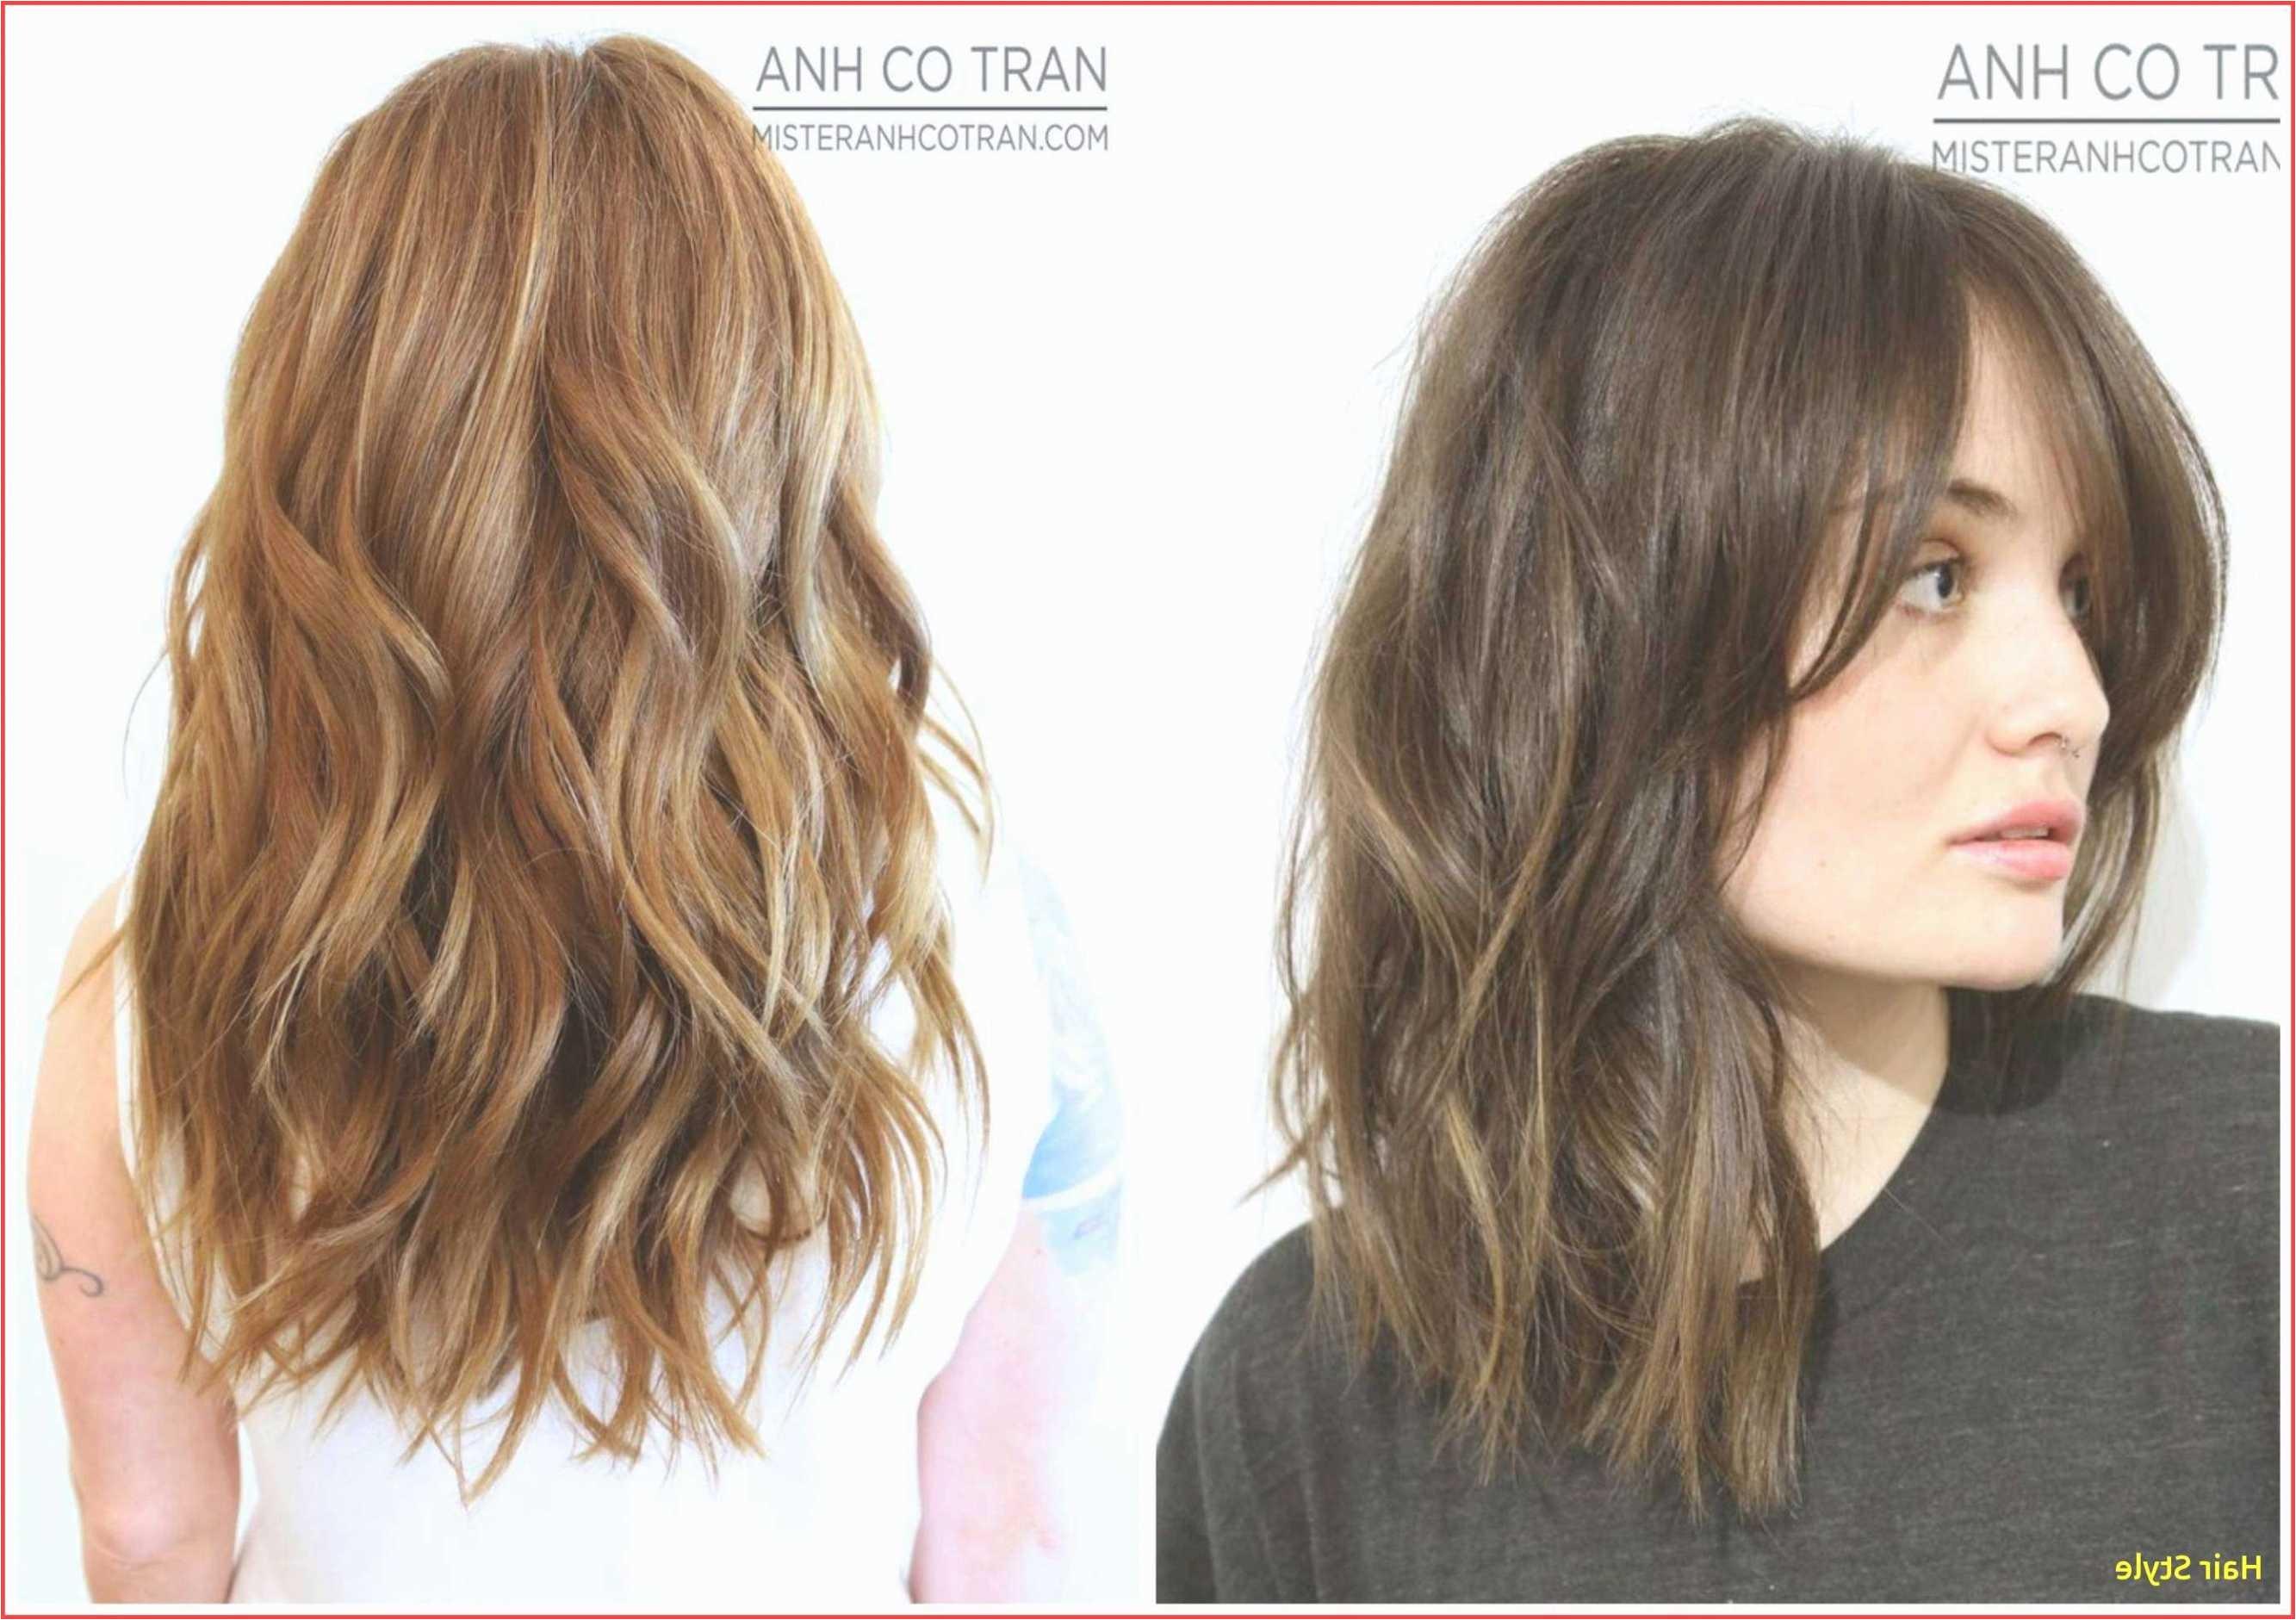 Korean Hairstyles for Girl Beautiful Beautiful Short Hairstyles for Wavy asian Hair